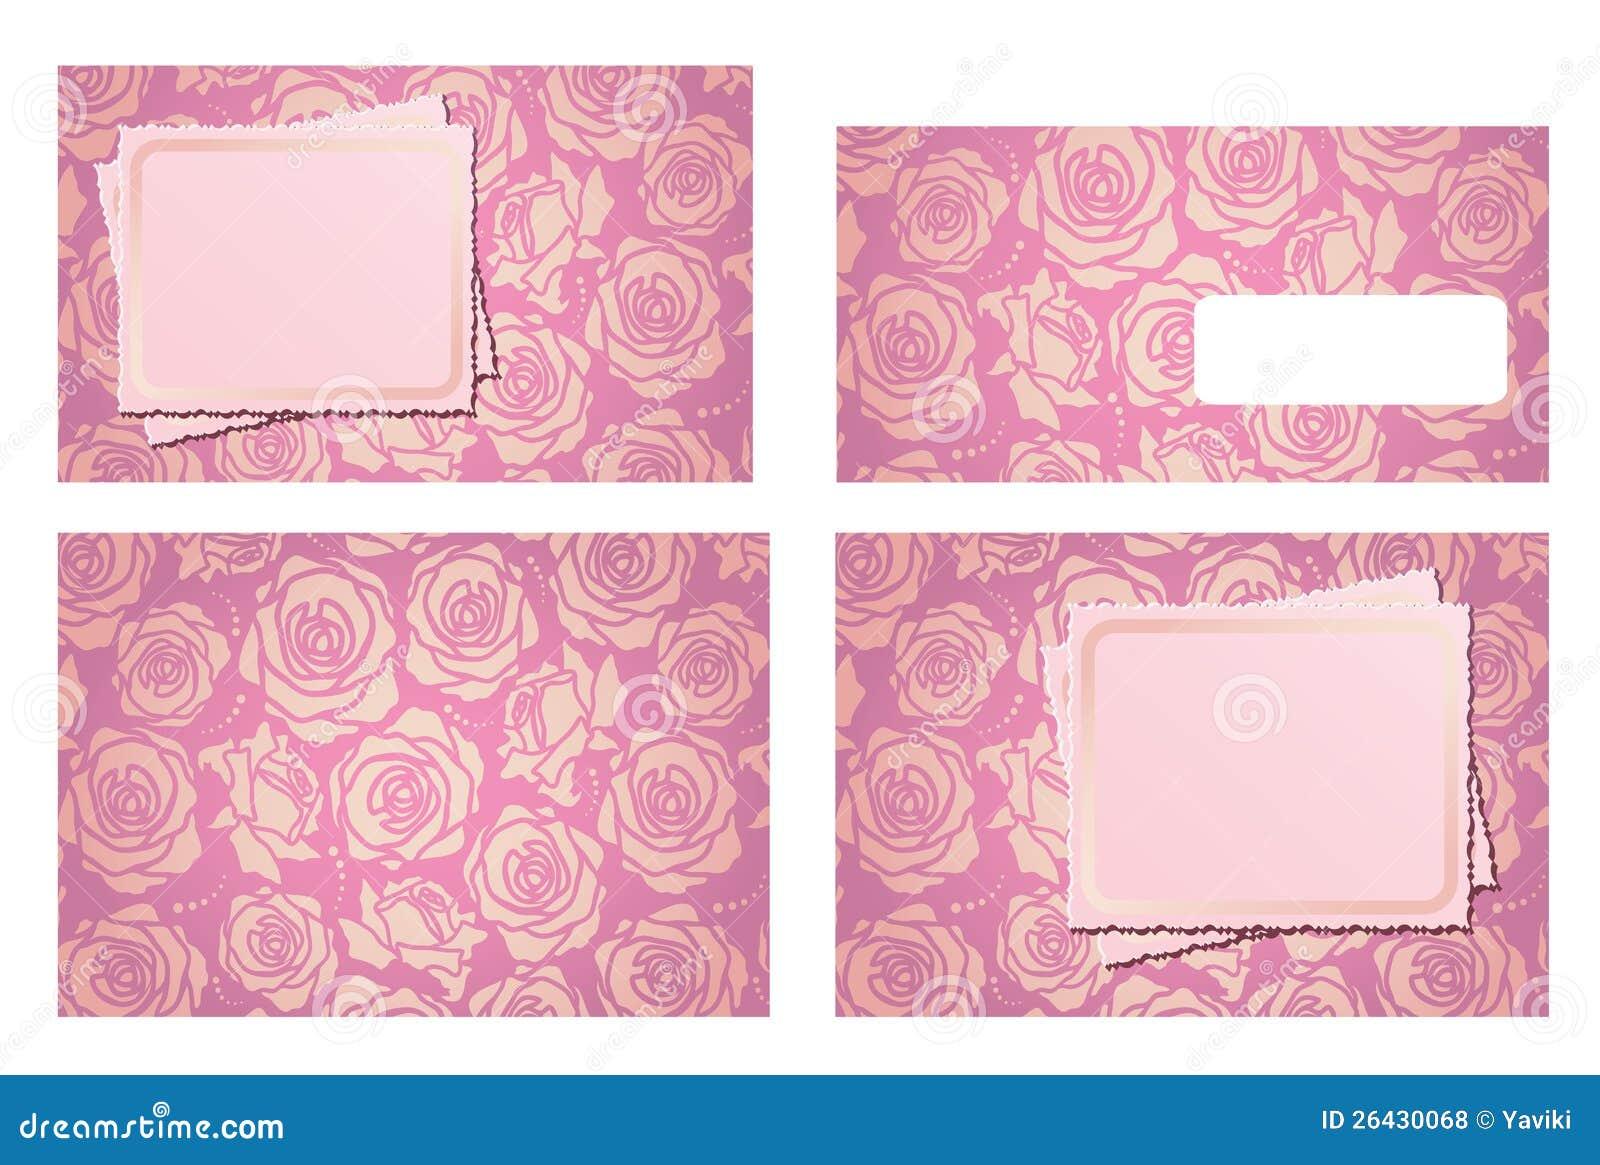 Wedding Invitation Template Set And Envelope Royalty Free Stock Photos ...